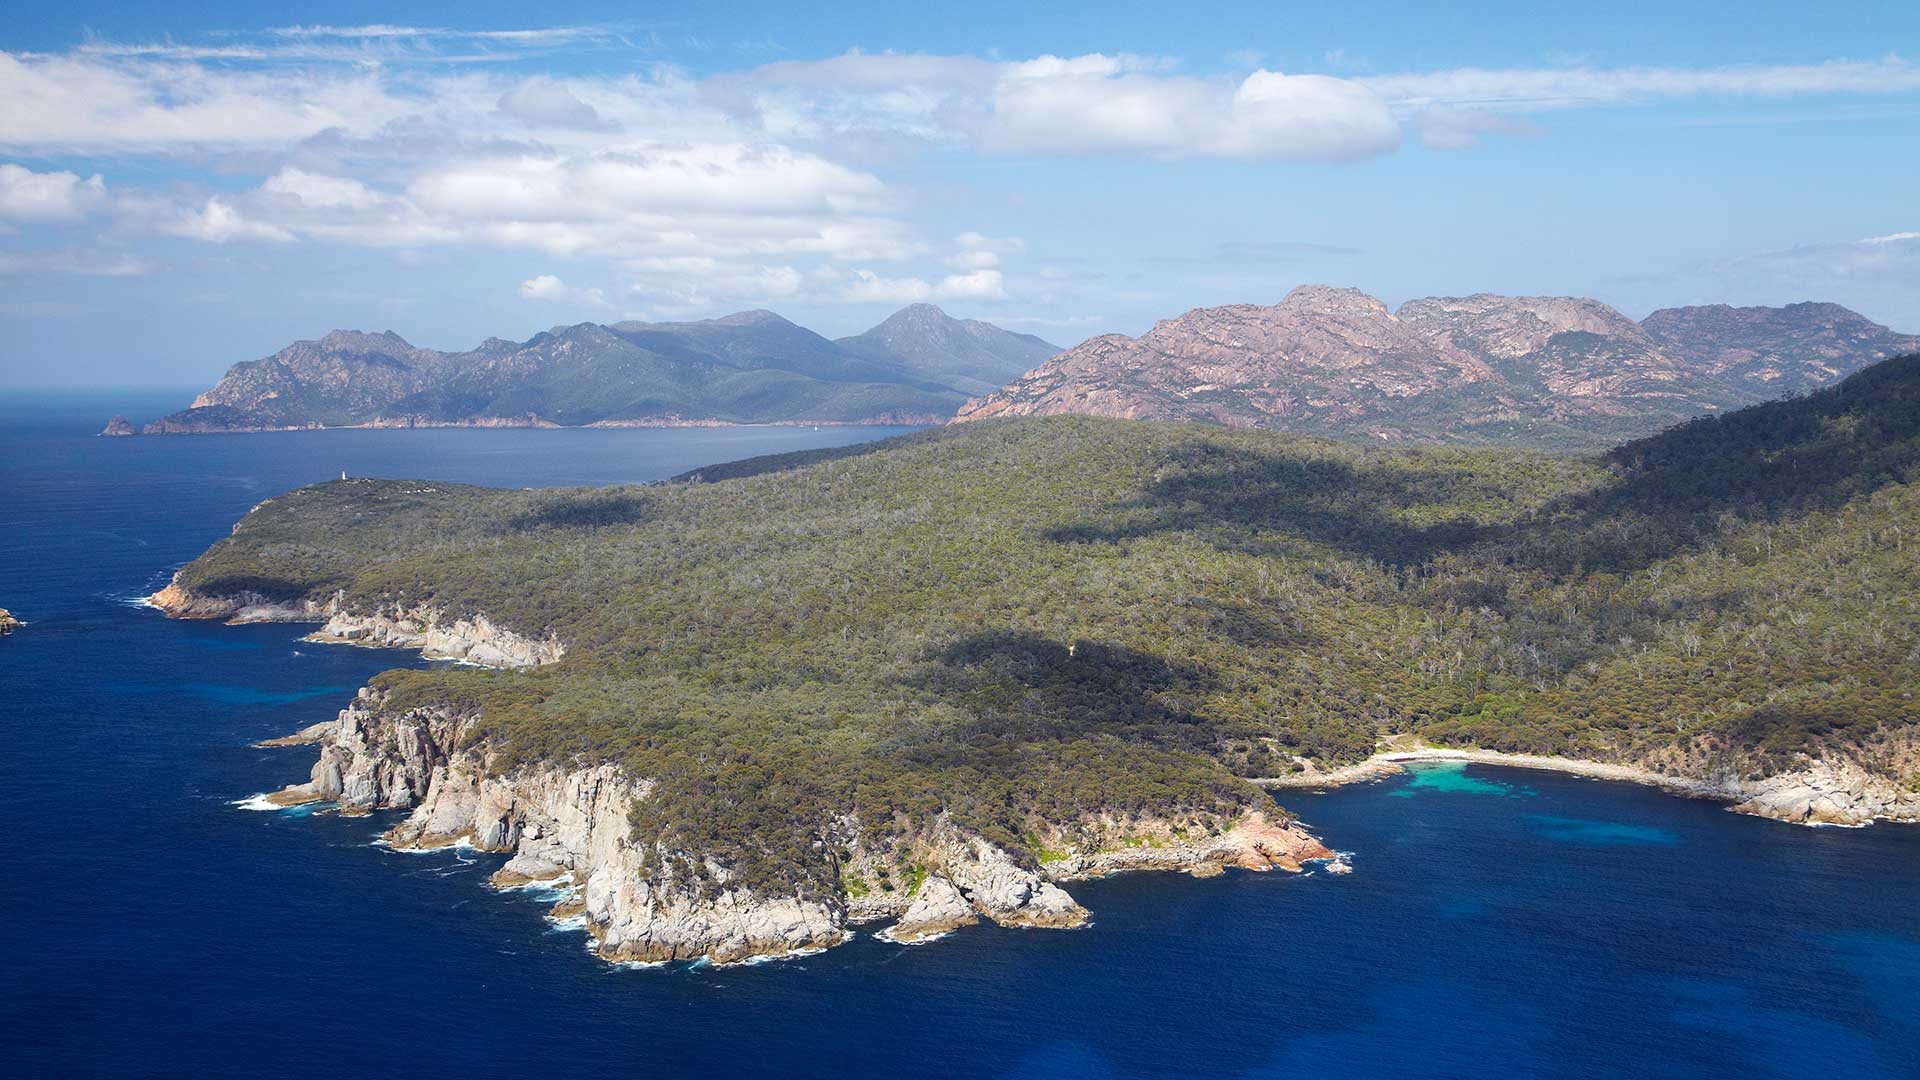 Cape Tourville, Freycinet National Park, Freycinet Peninsula, Eastern Tasmania, Australia